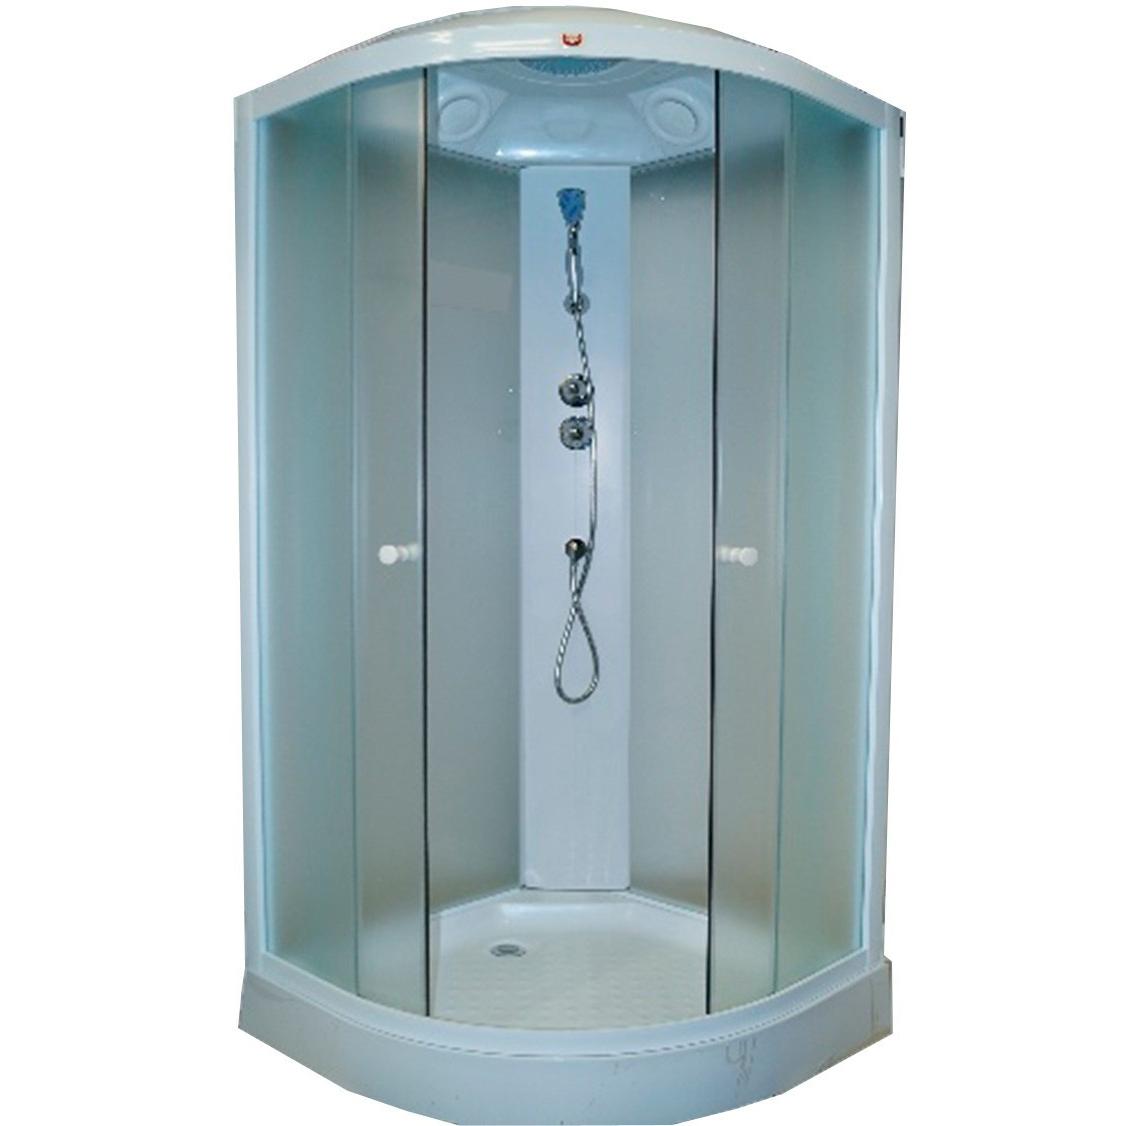 Душевая кабина Parly ET101 noname 3092 тропический душ